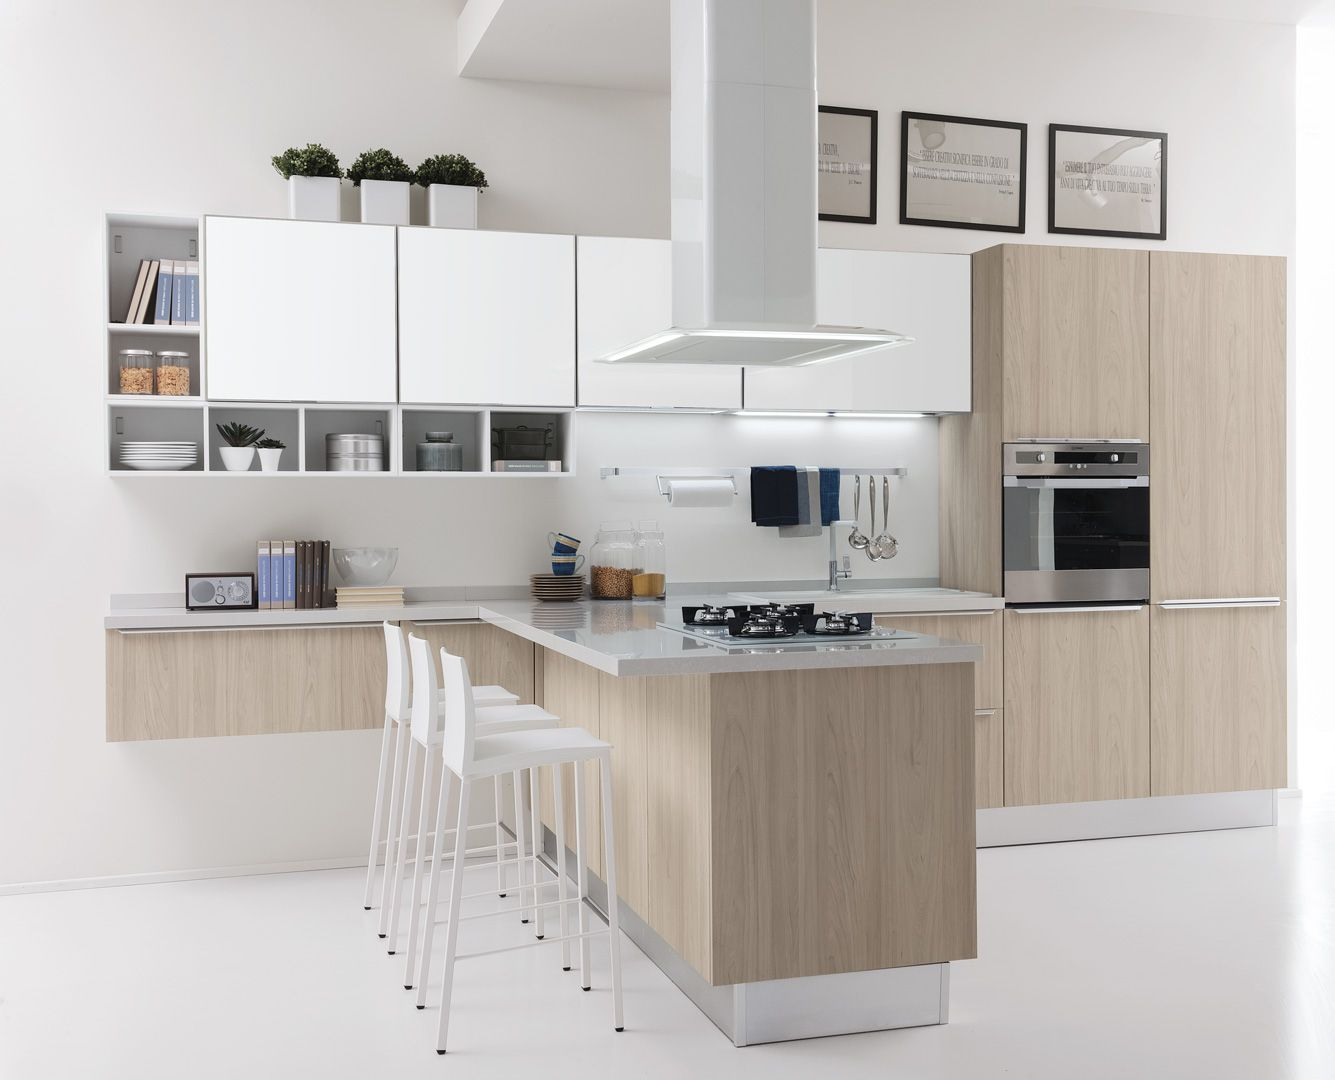 Pin su Cucine Moderne Creo Kitchens